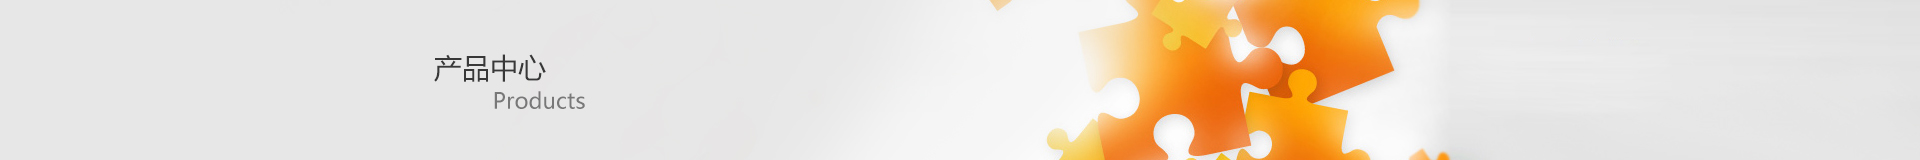 上海亚博体育app苹果版banner